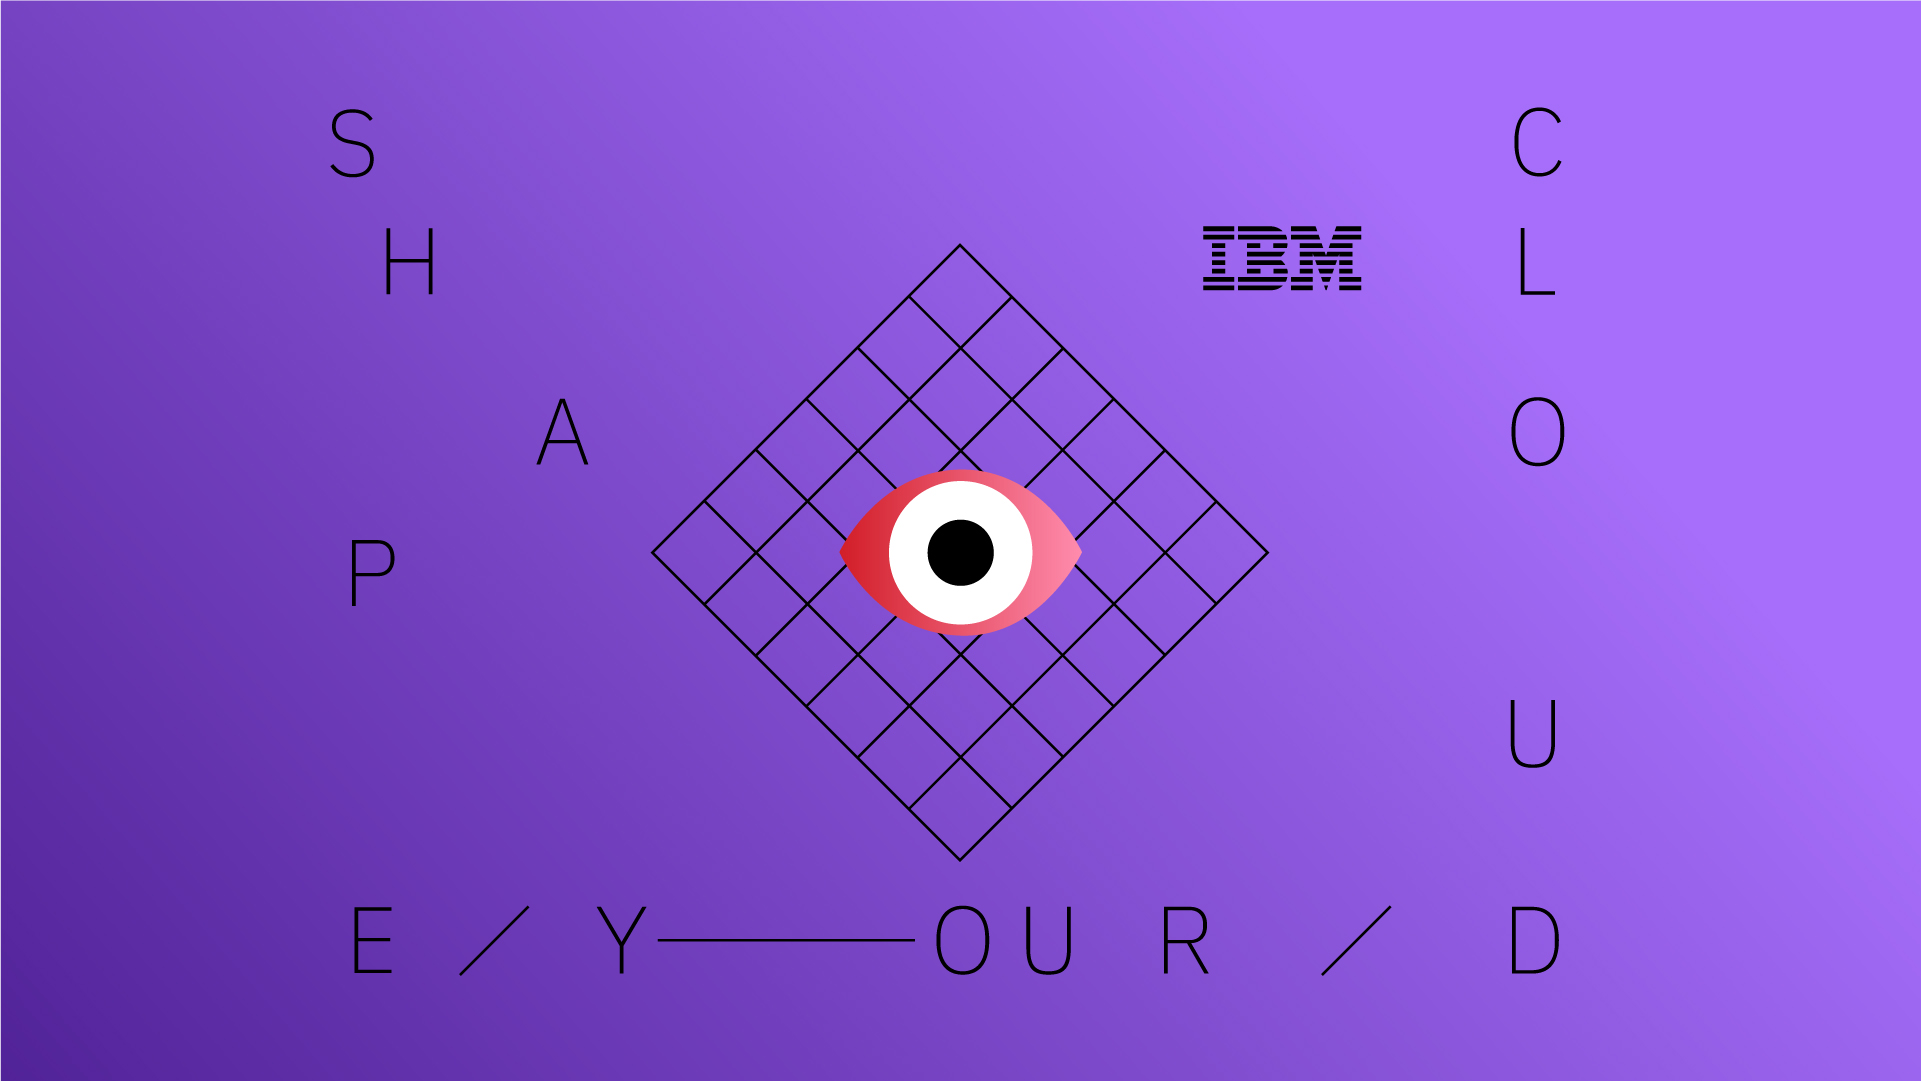 IBM_SHAPE-YOUR-CLOUD_DC_EDITS_BH_proceso_IBM-process-8.jpg